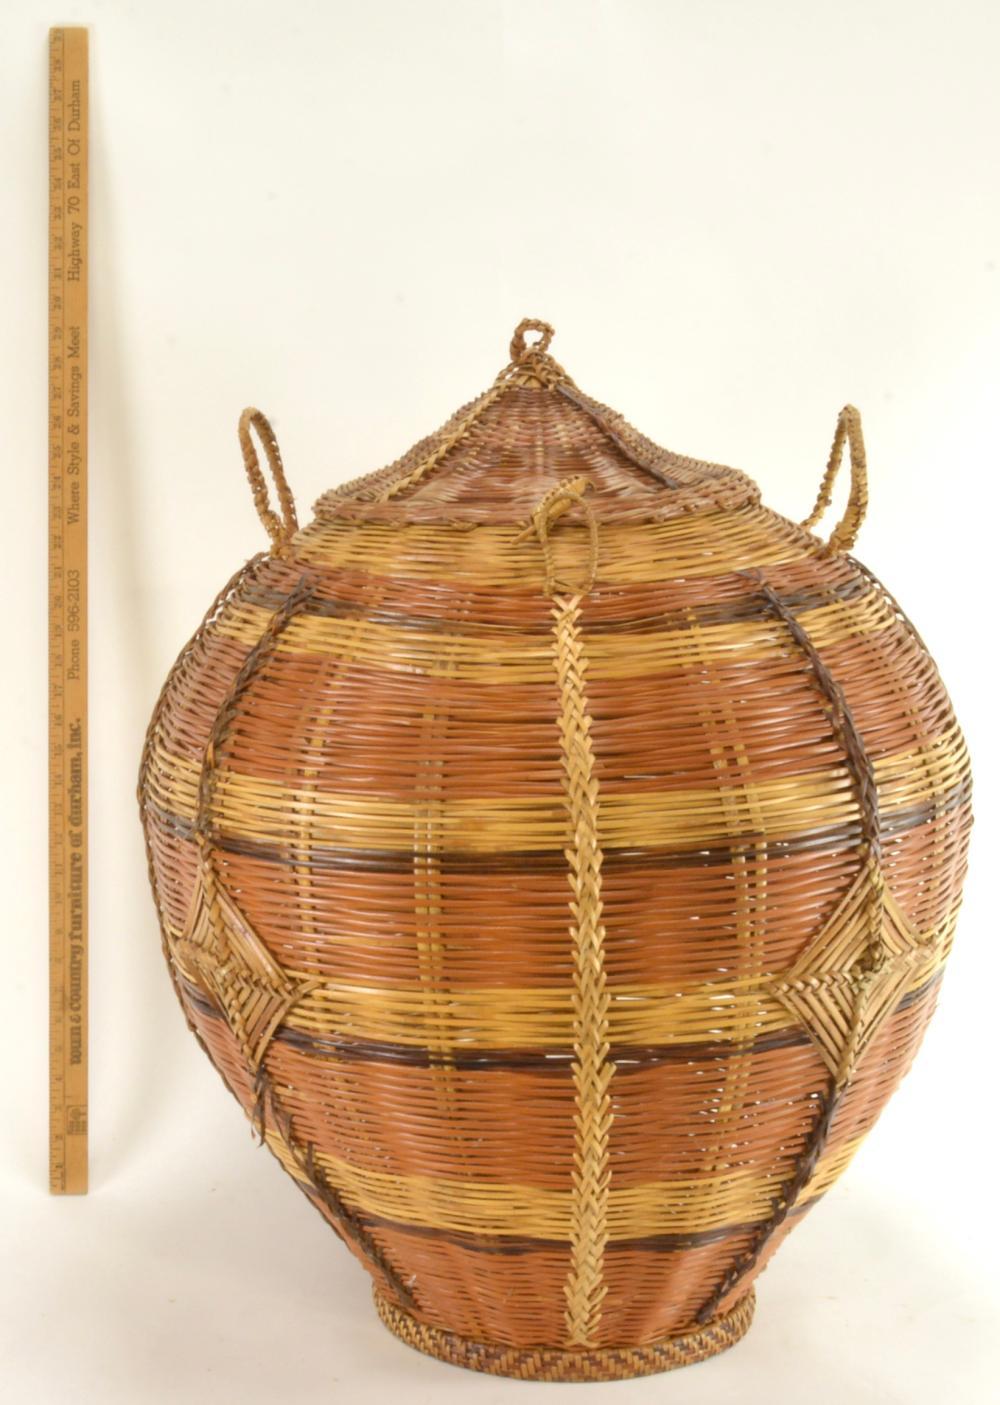 Vintage Filipino Woven Rattan Storage Basket